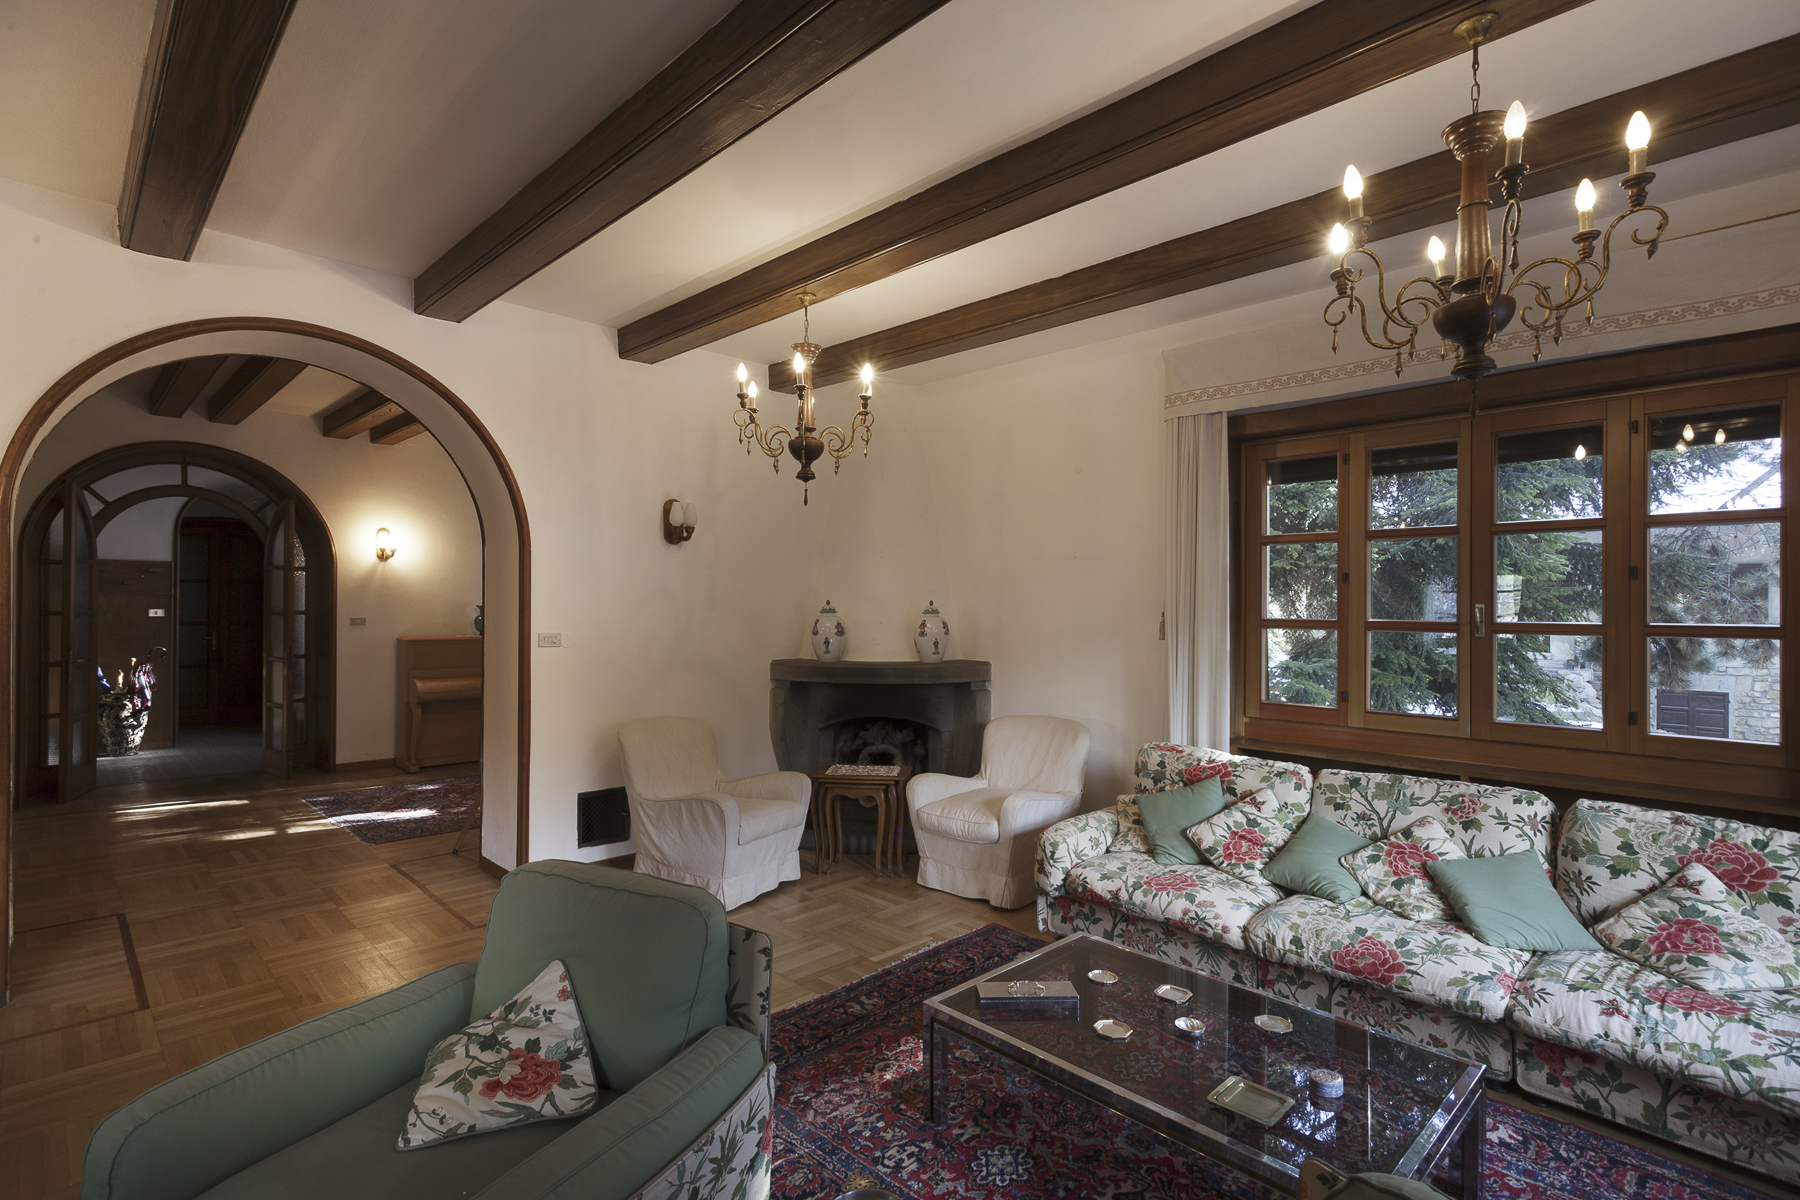 Villa in Vendita a Courmayeur: 5 locali, 2200 mq - Foto 5